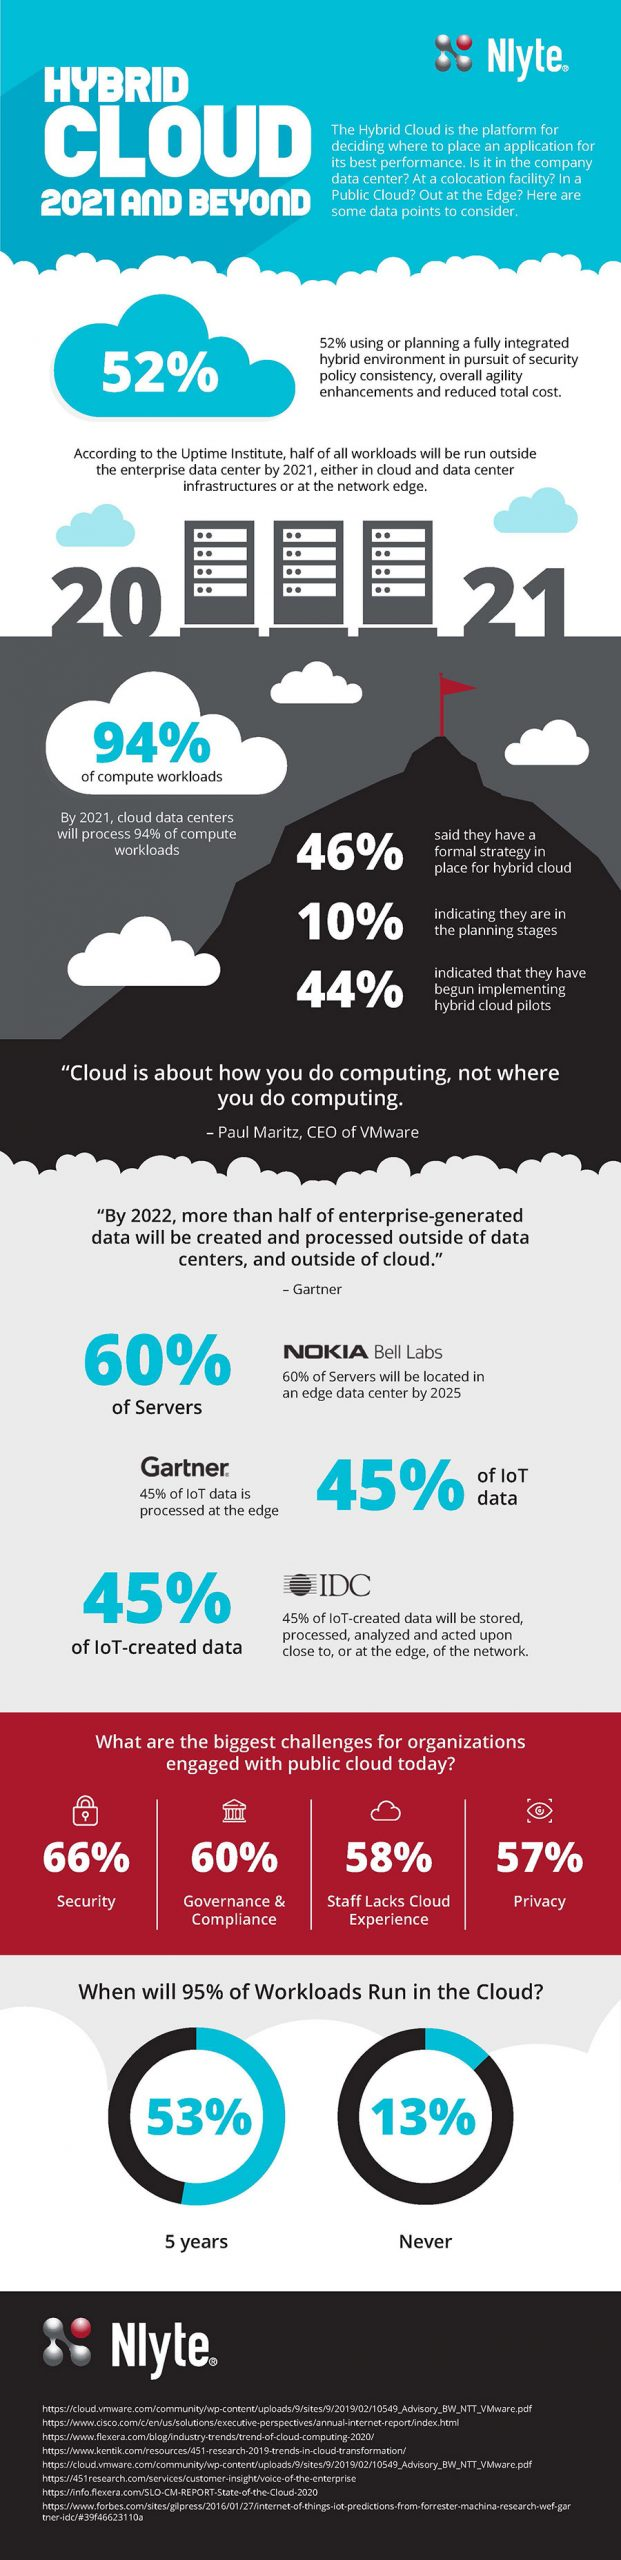 hybrid cloud 2021 infographic